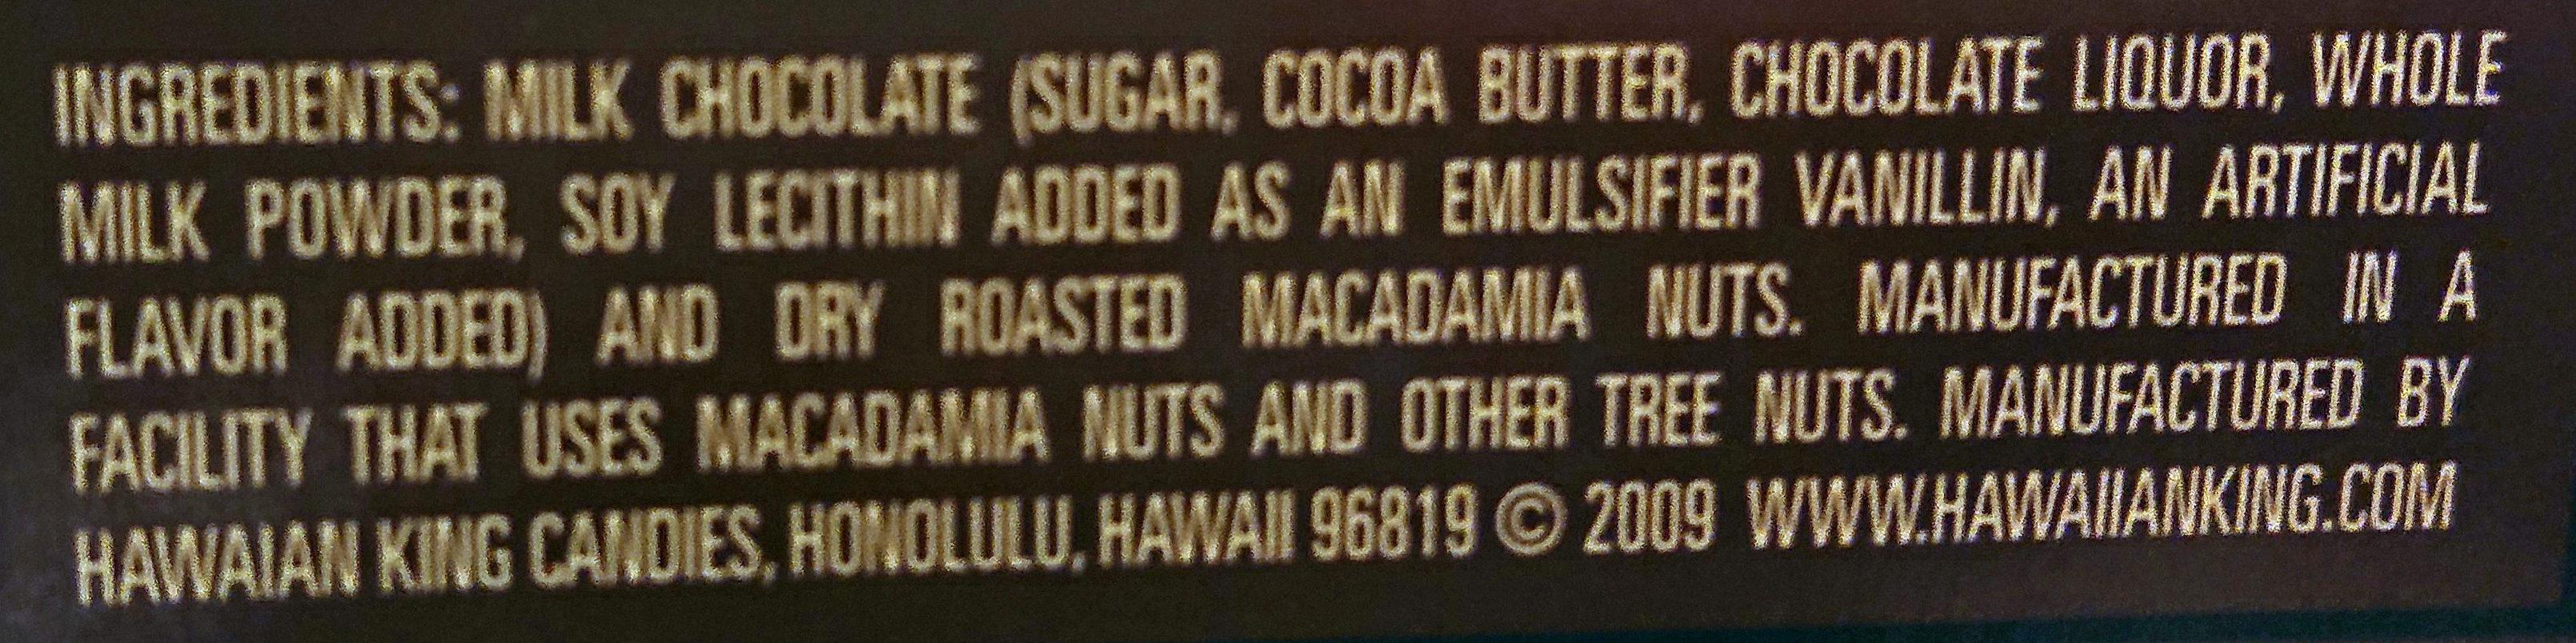 Milk chocolate covered macadamia nuts wholes and halves - Ingredients - en